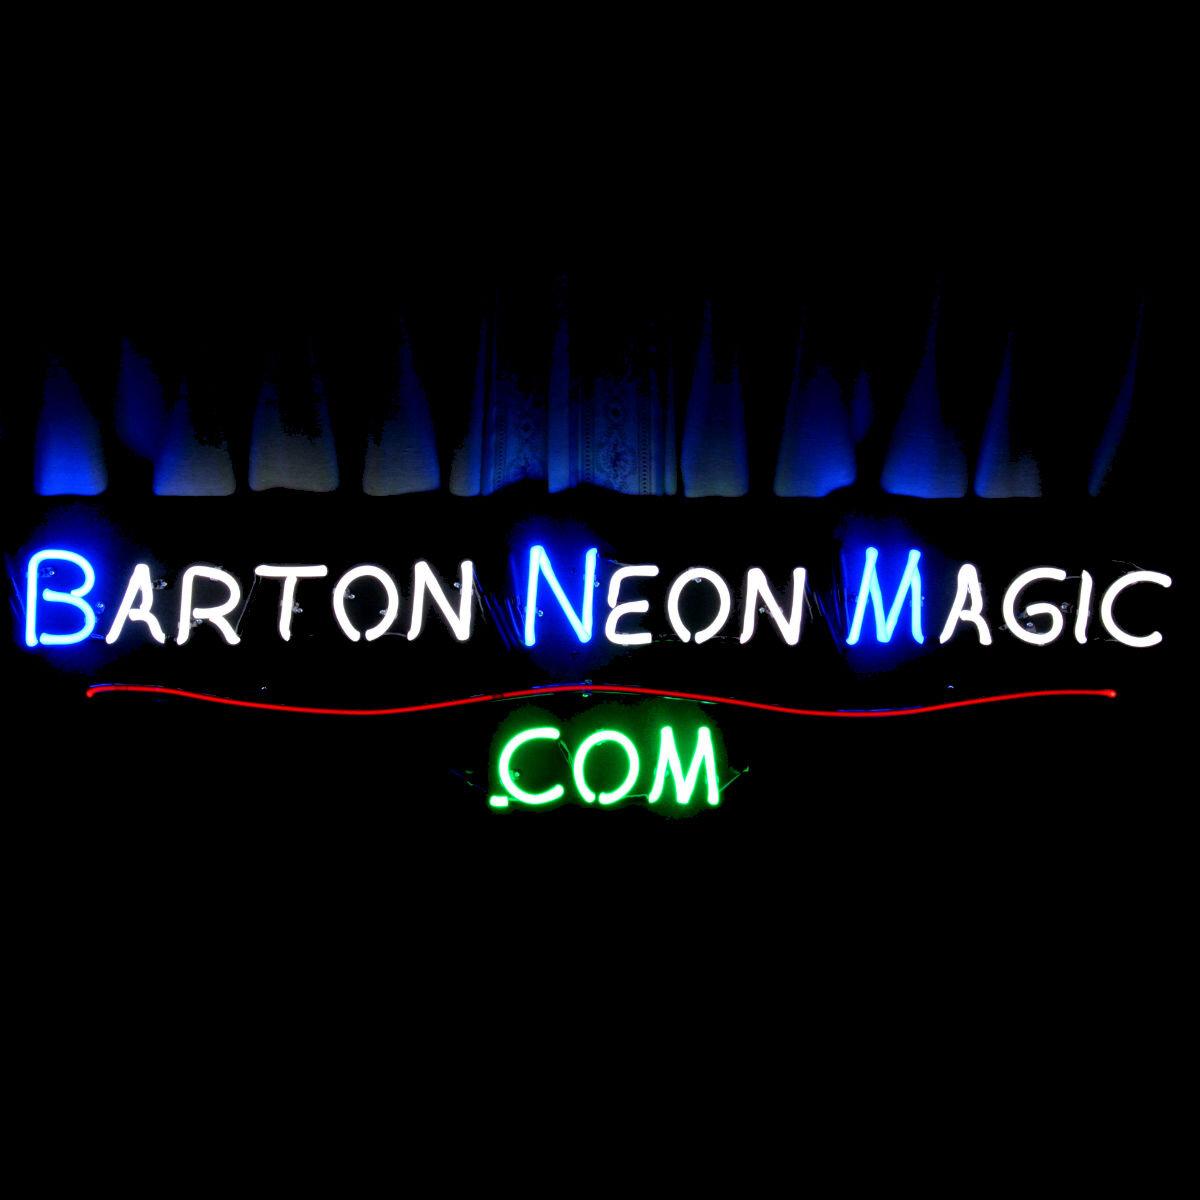 KISS ME! ROMANTIC NEON LIGHT ARTWORK by John Barton - BartonNeonMagic.com